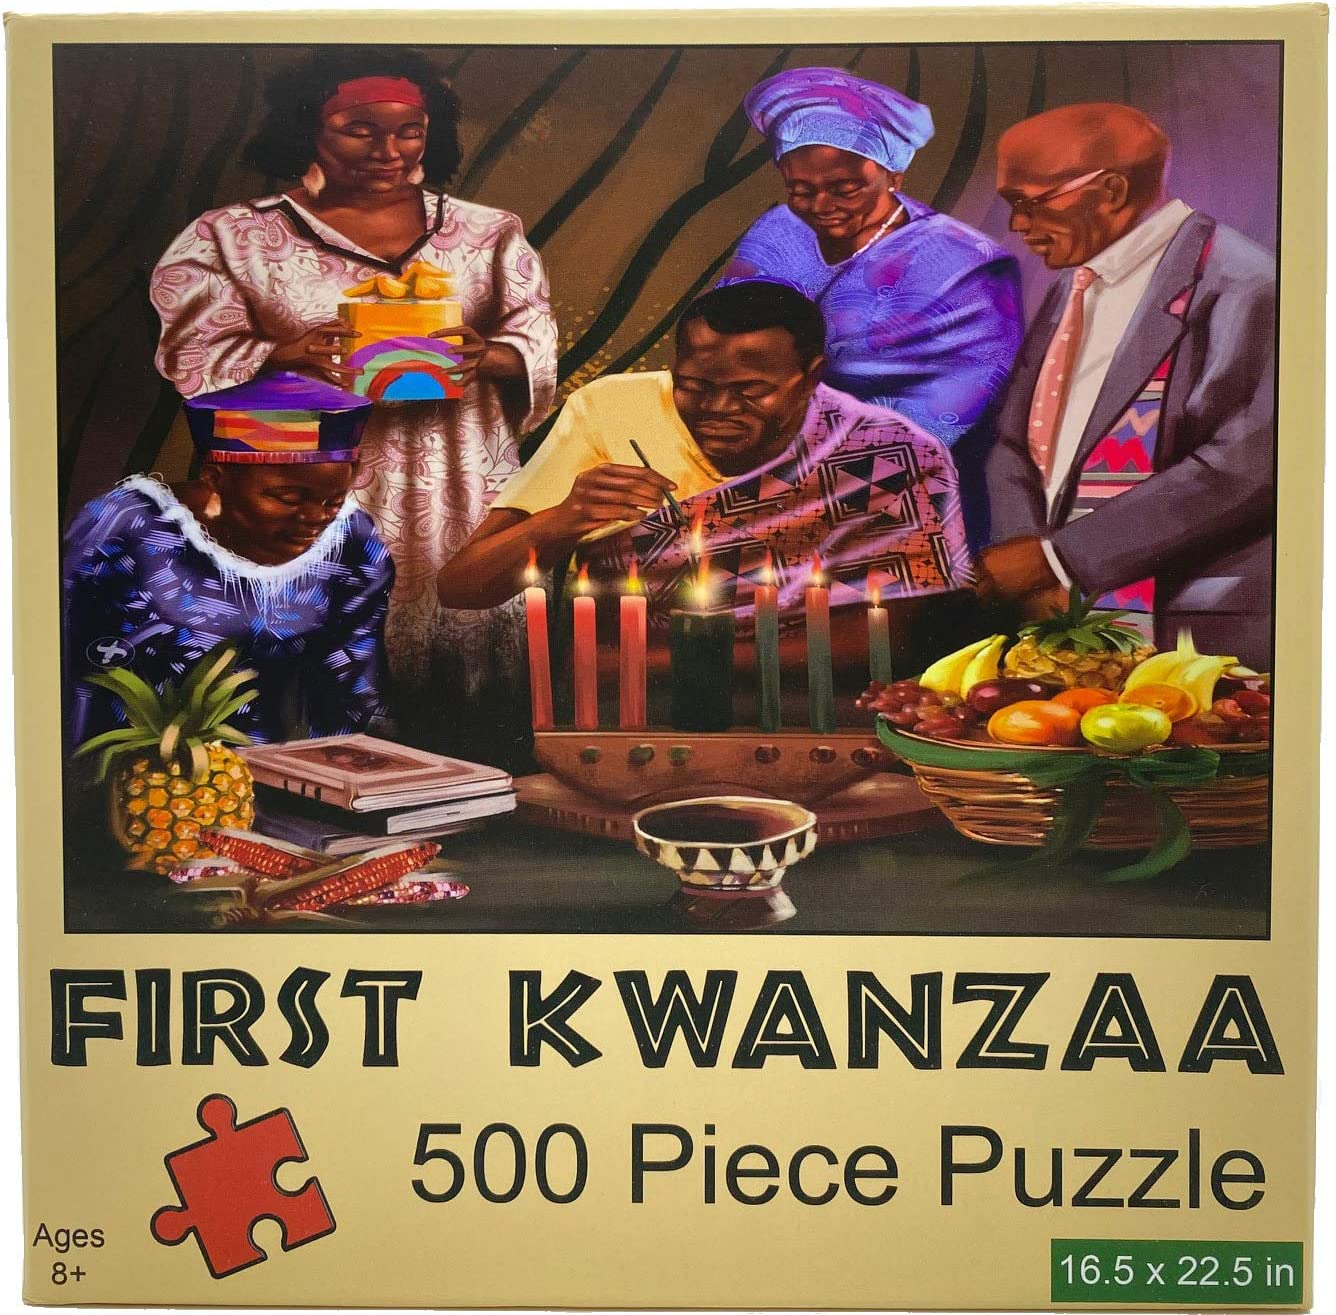 First Kwanzaa 500 Piece Jigsaw Puzzle